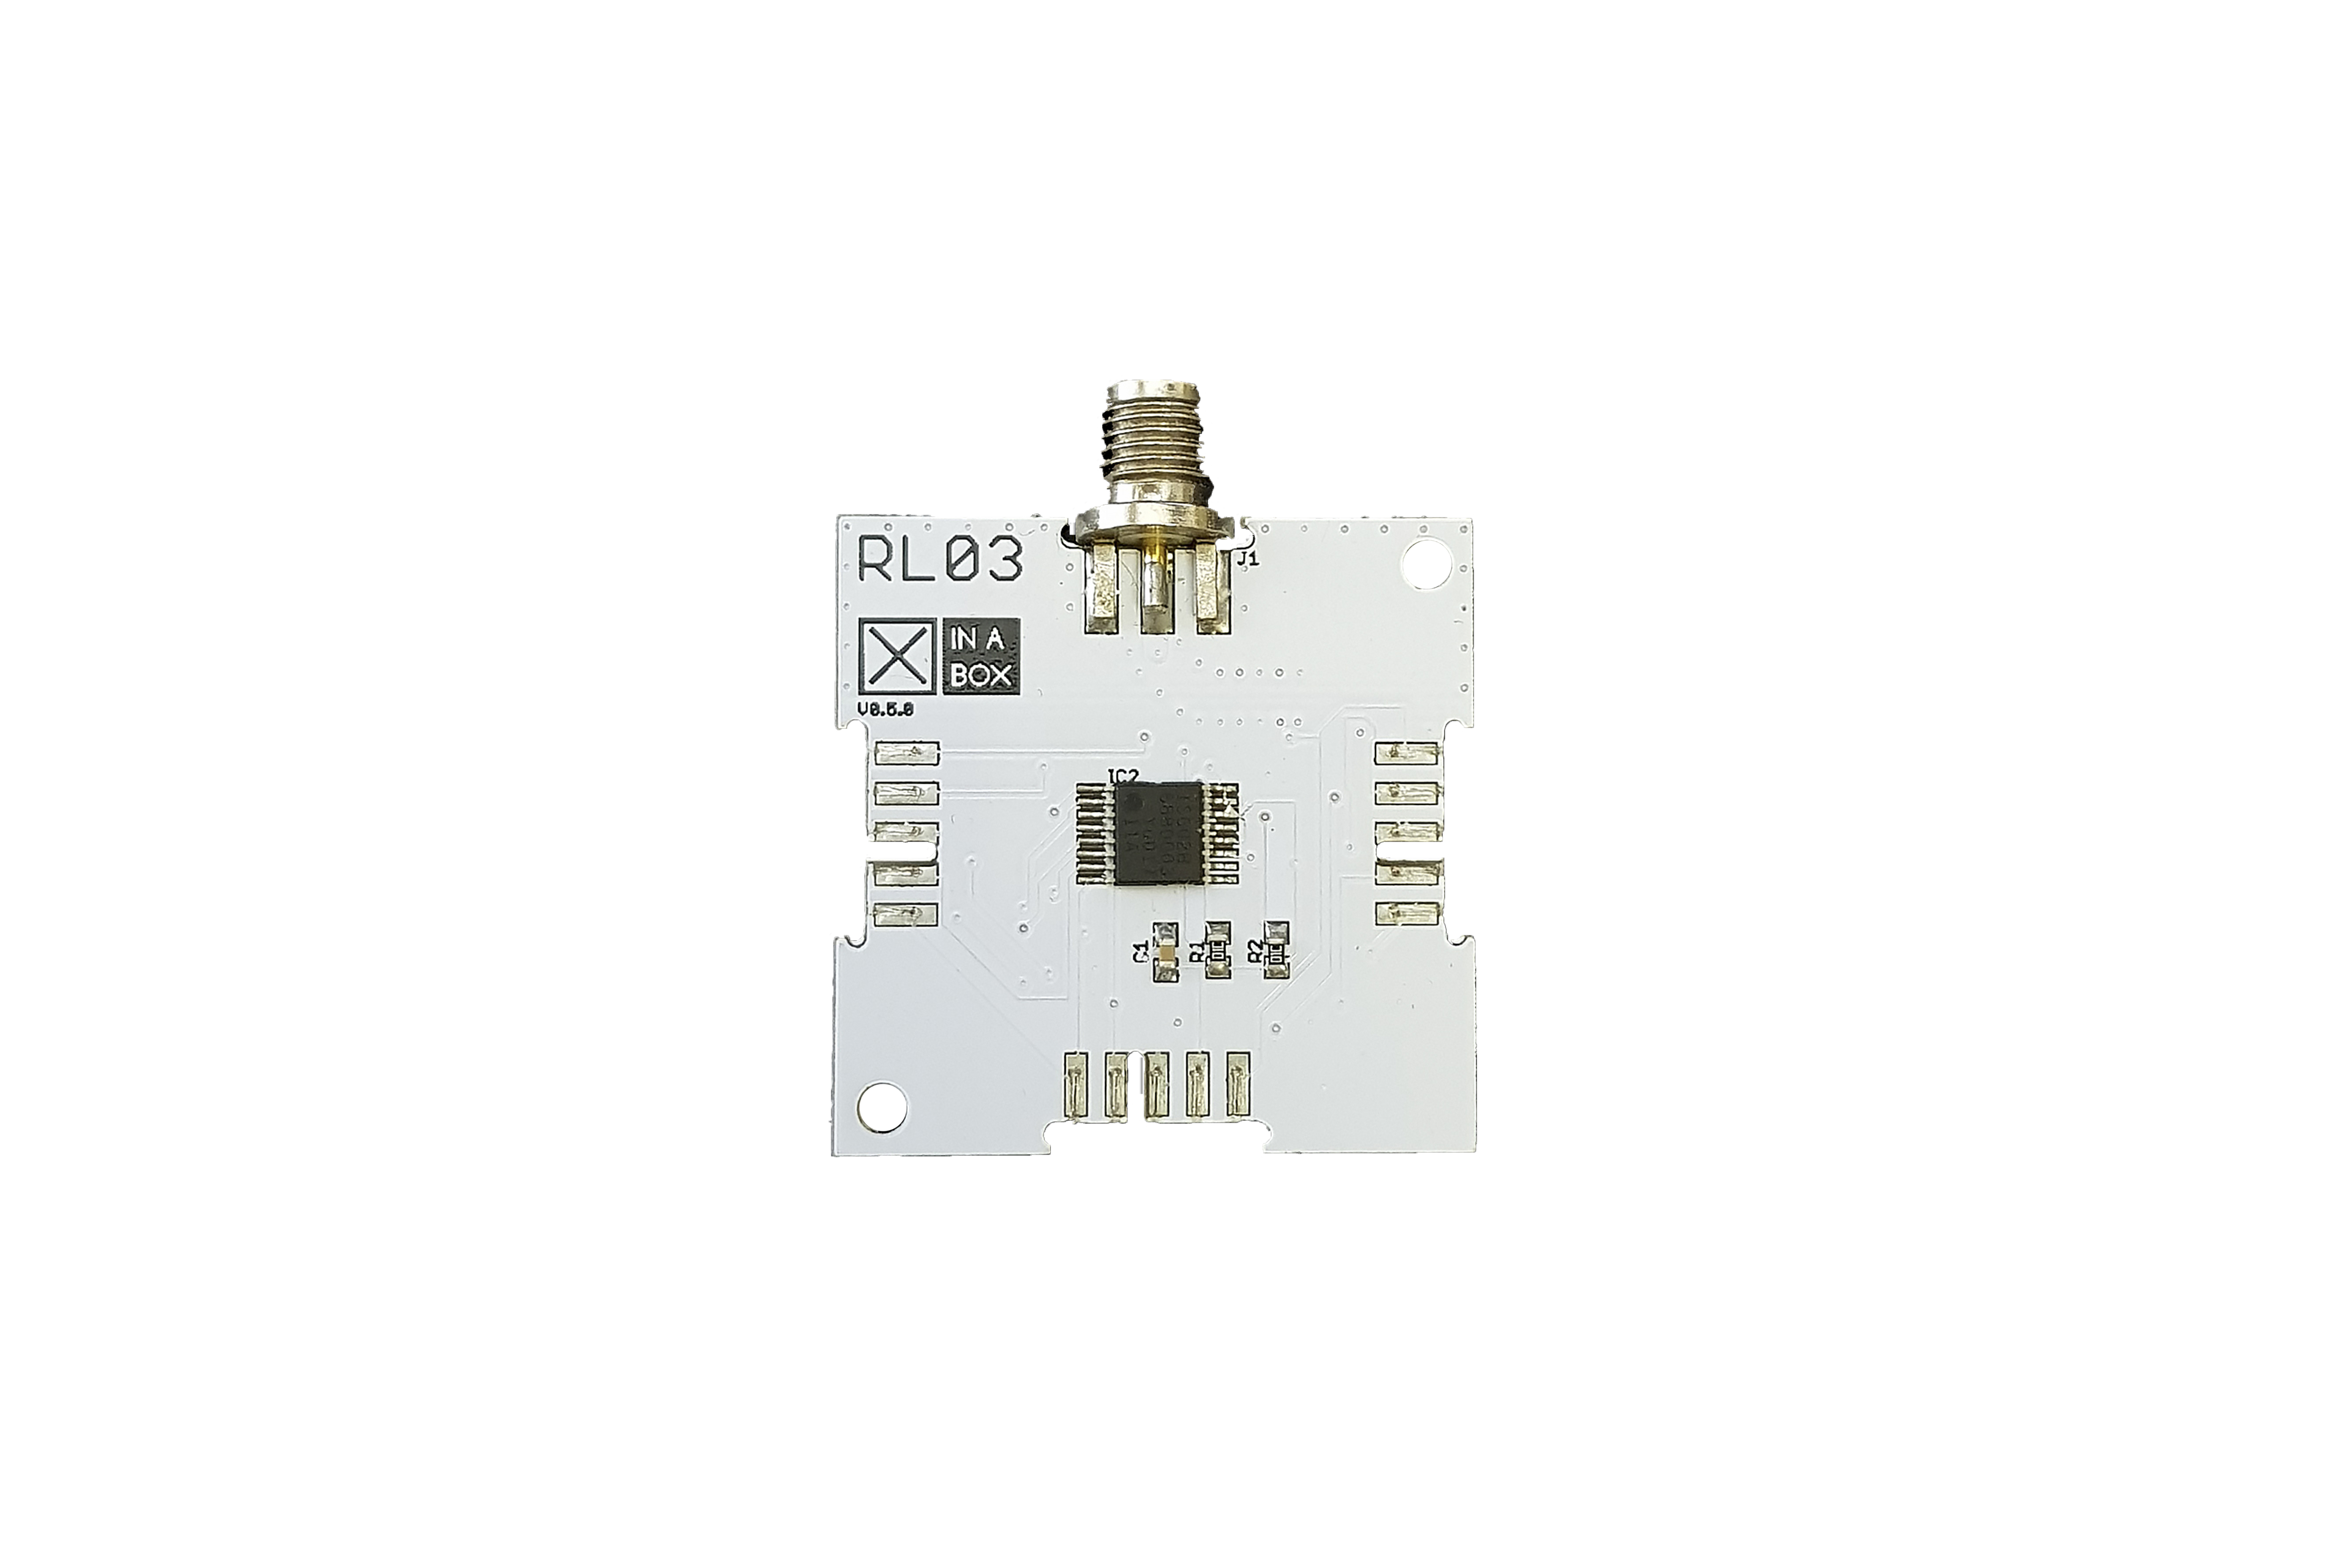 LoRa Radio 915 MHz RFM95W, SC18IS602B